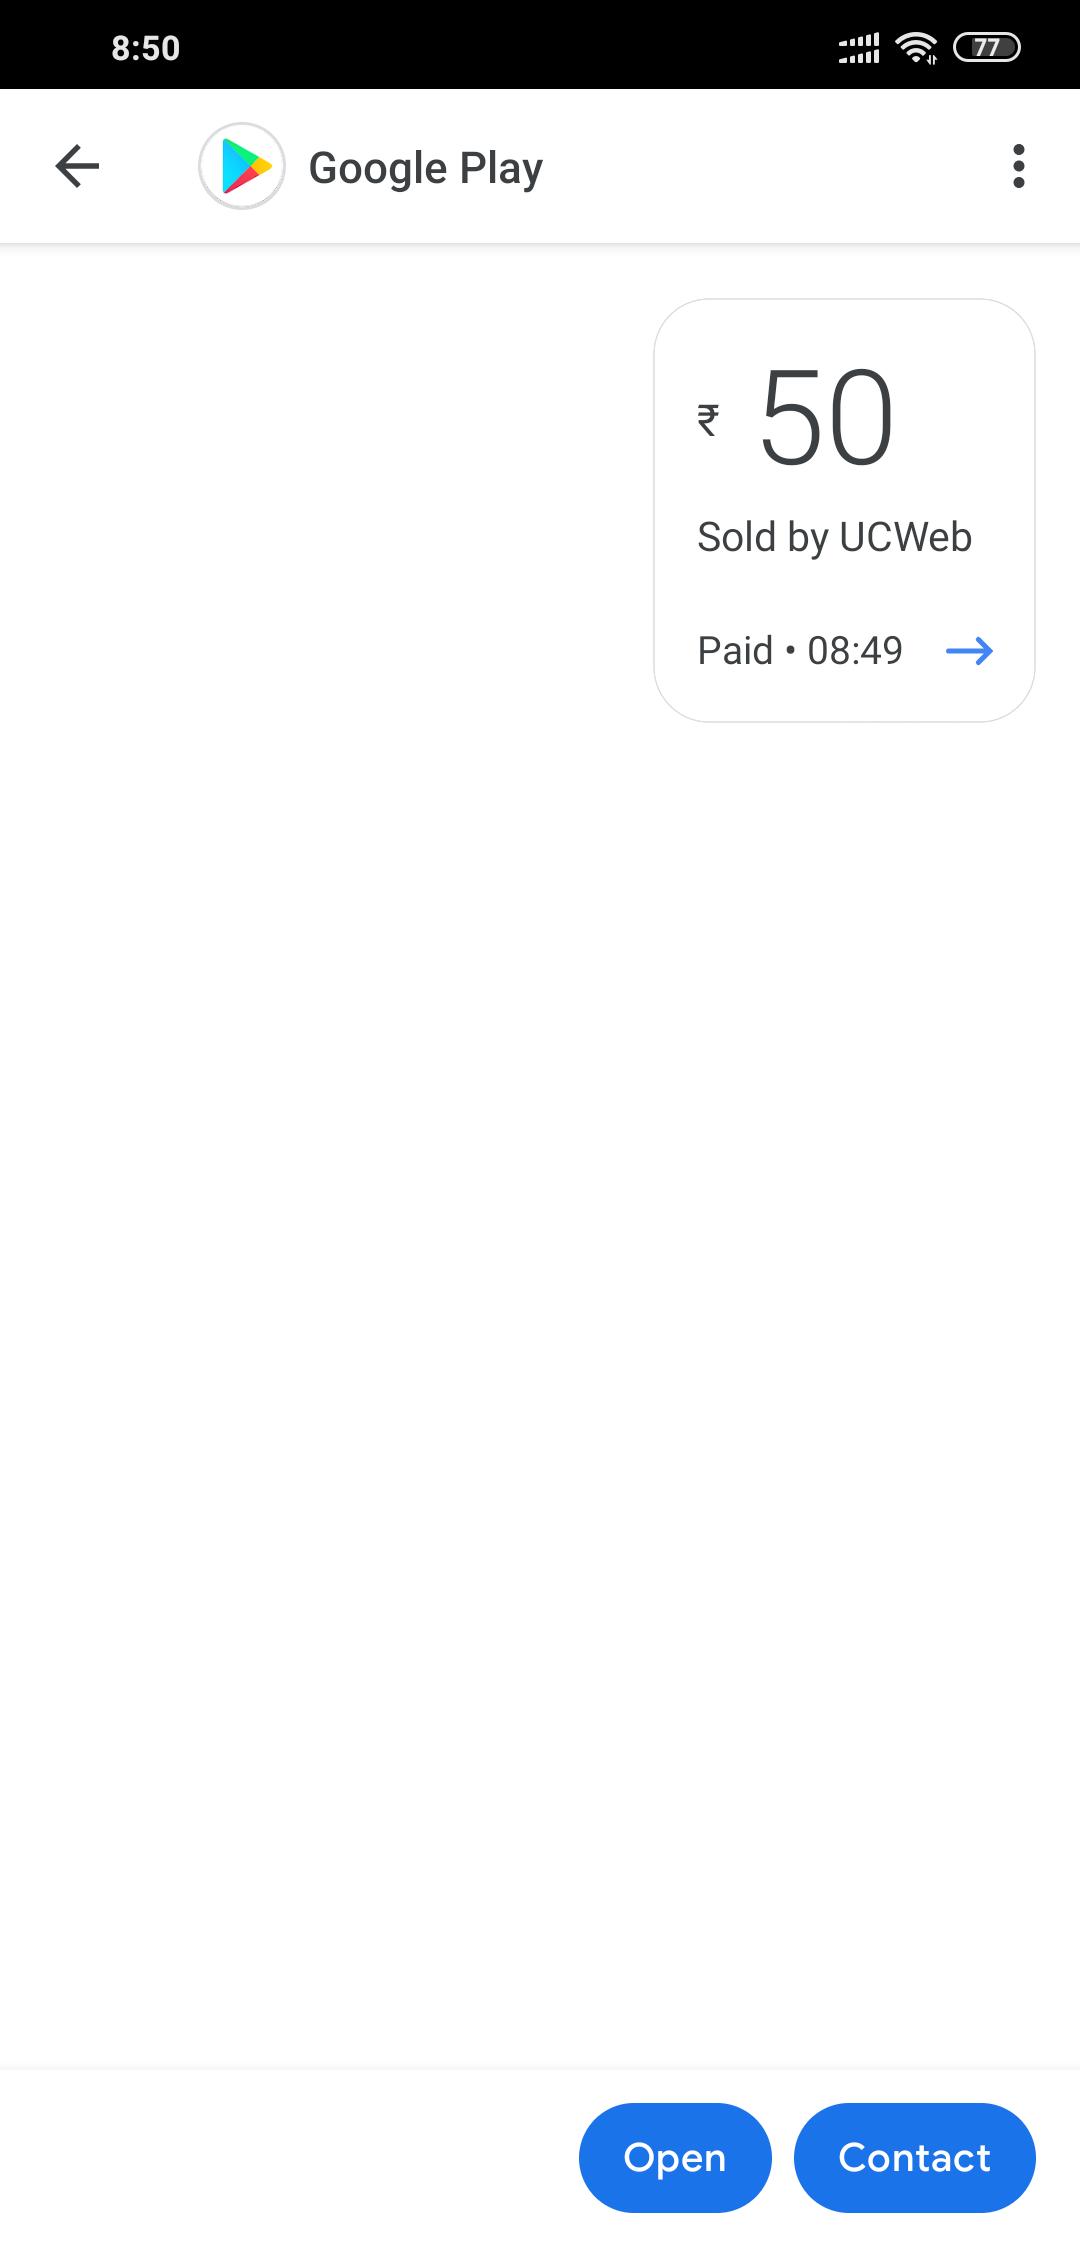 https://cdn0.desidime.com/attachments/photos/593526/original/Screenshot_2019-11-03-08-50-49-383_com.google.android.apps.nbu.paisa.user.png?1572751279